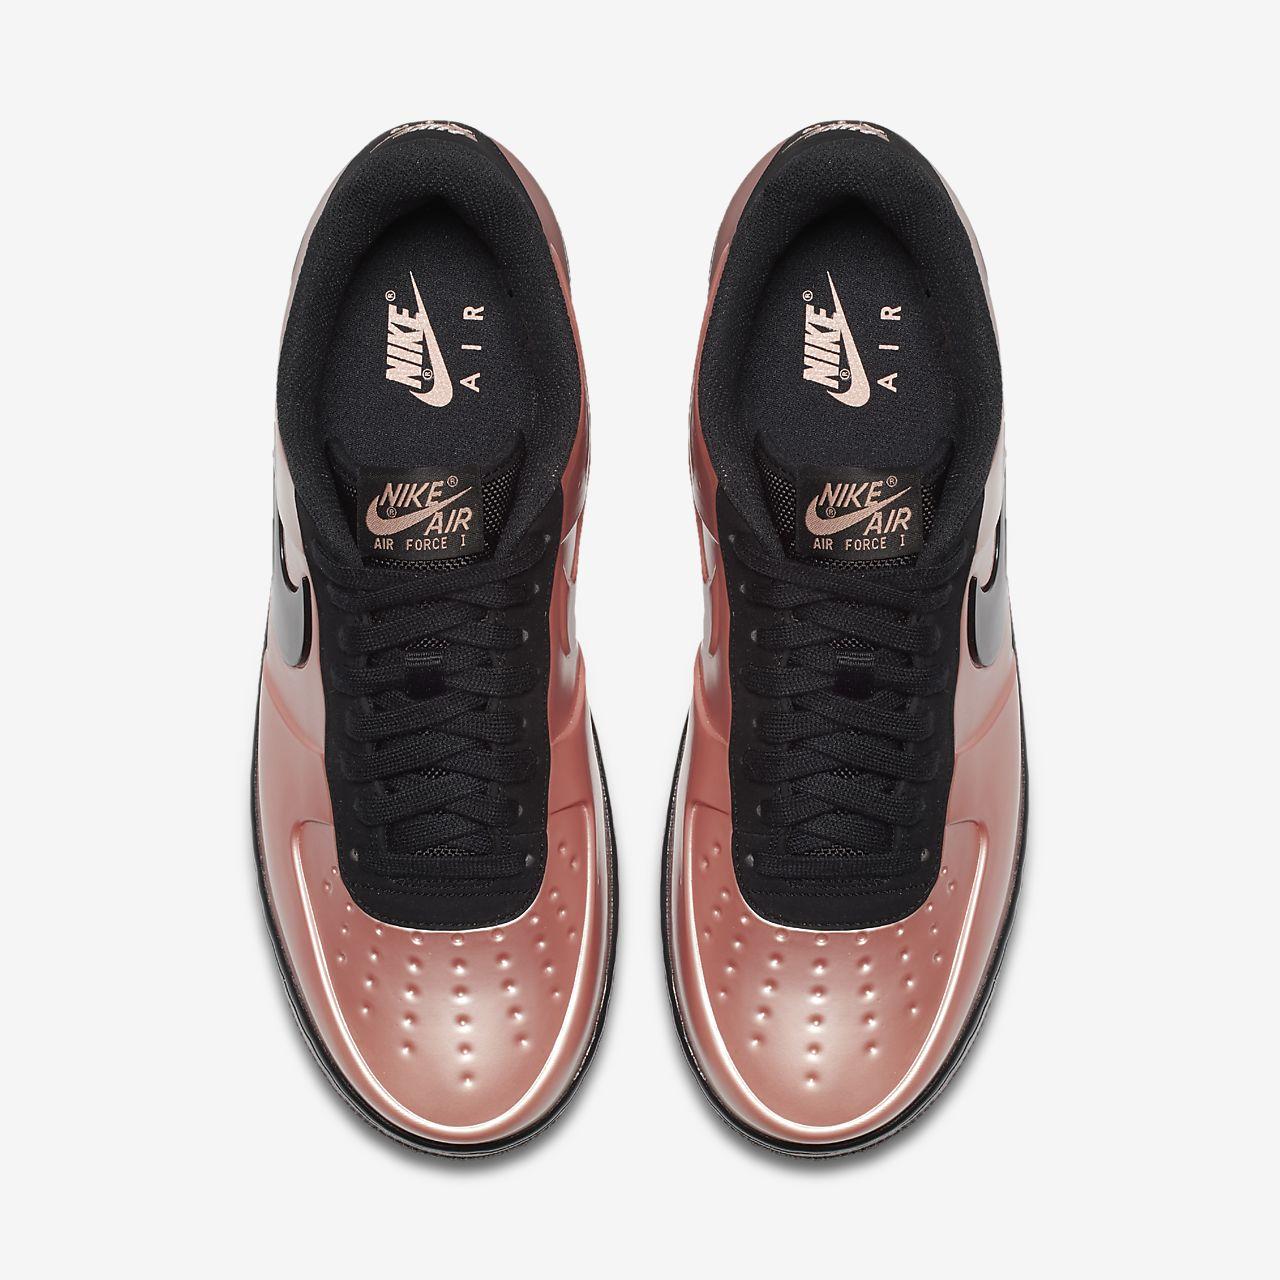 nike air force 1 '07 low camo heren schoenen